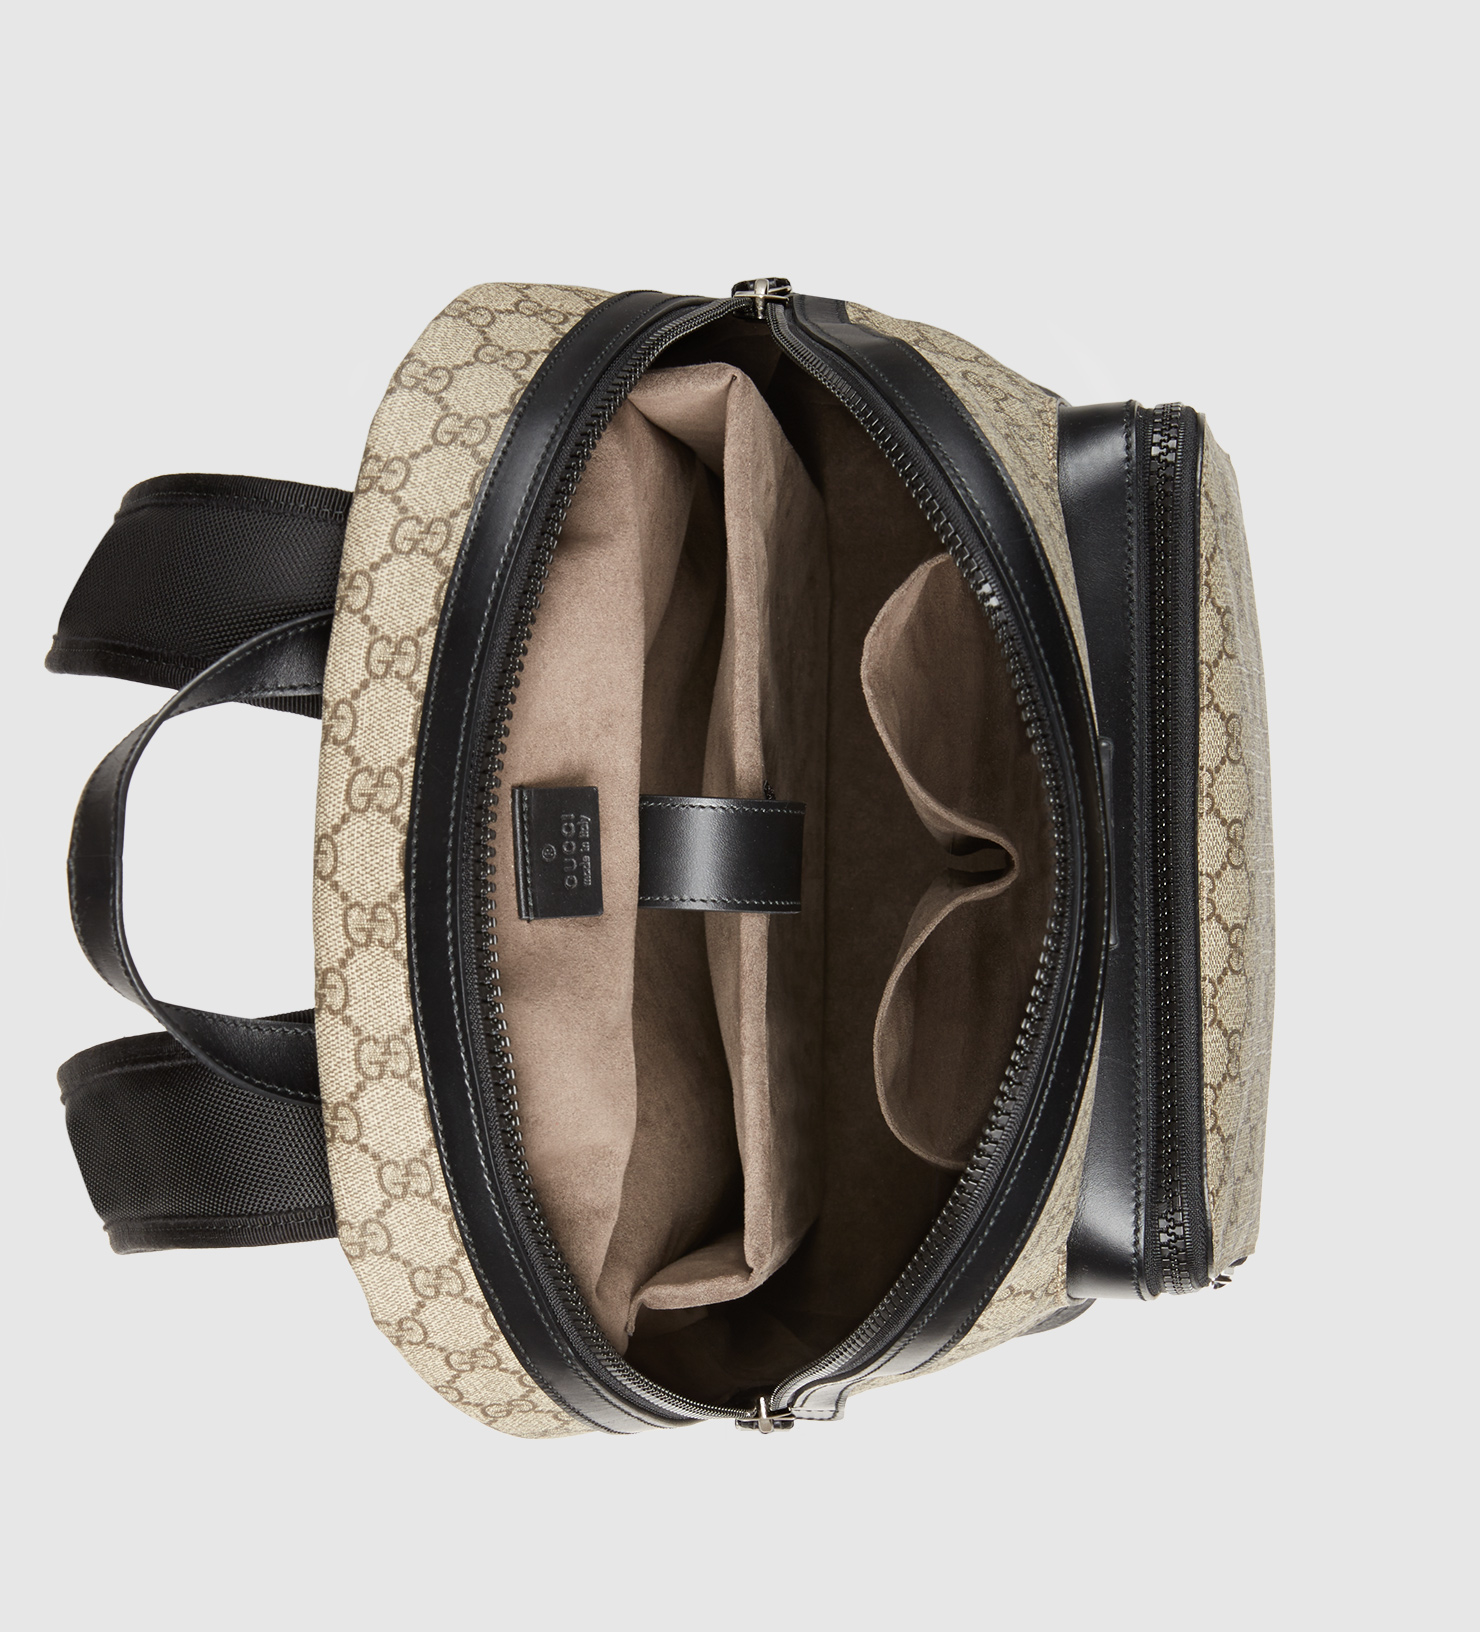 ced1307c221 Lyst - Gucci Gg Supreme Backpack in Black for Men